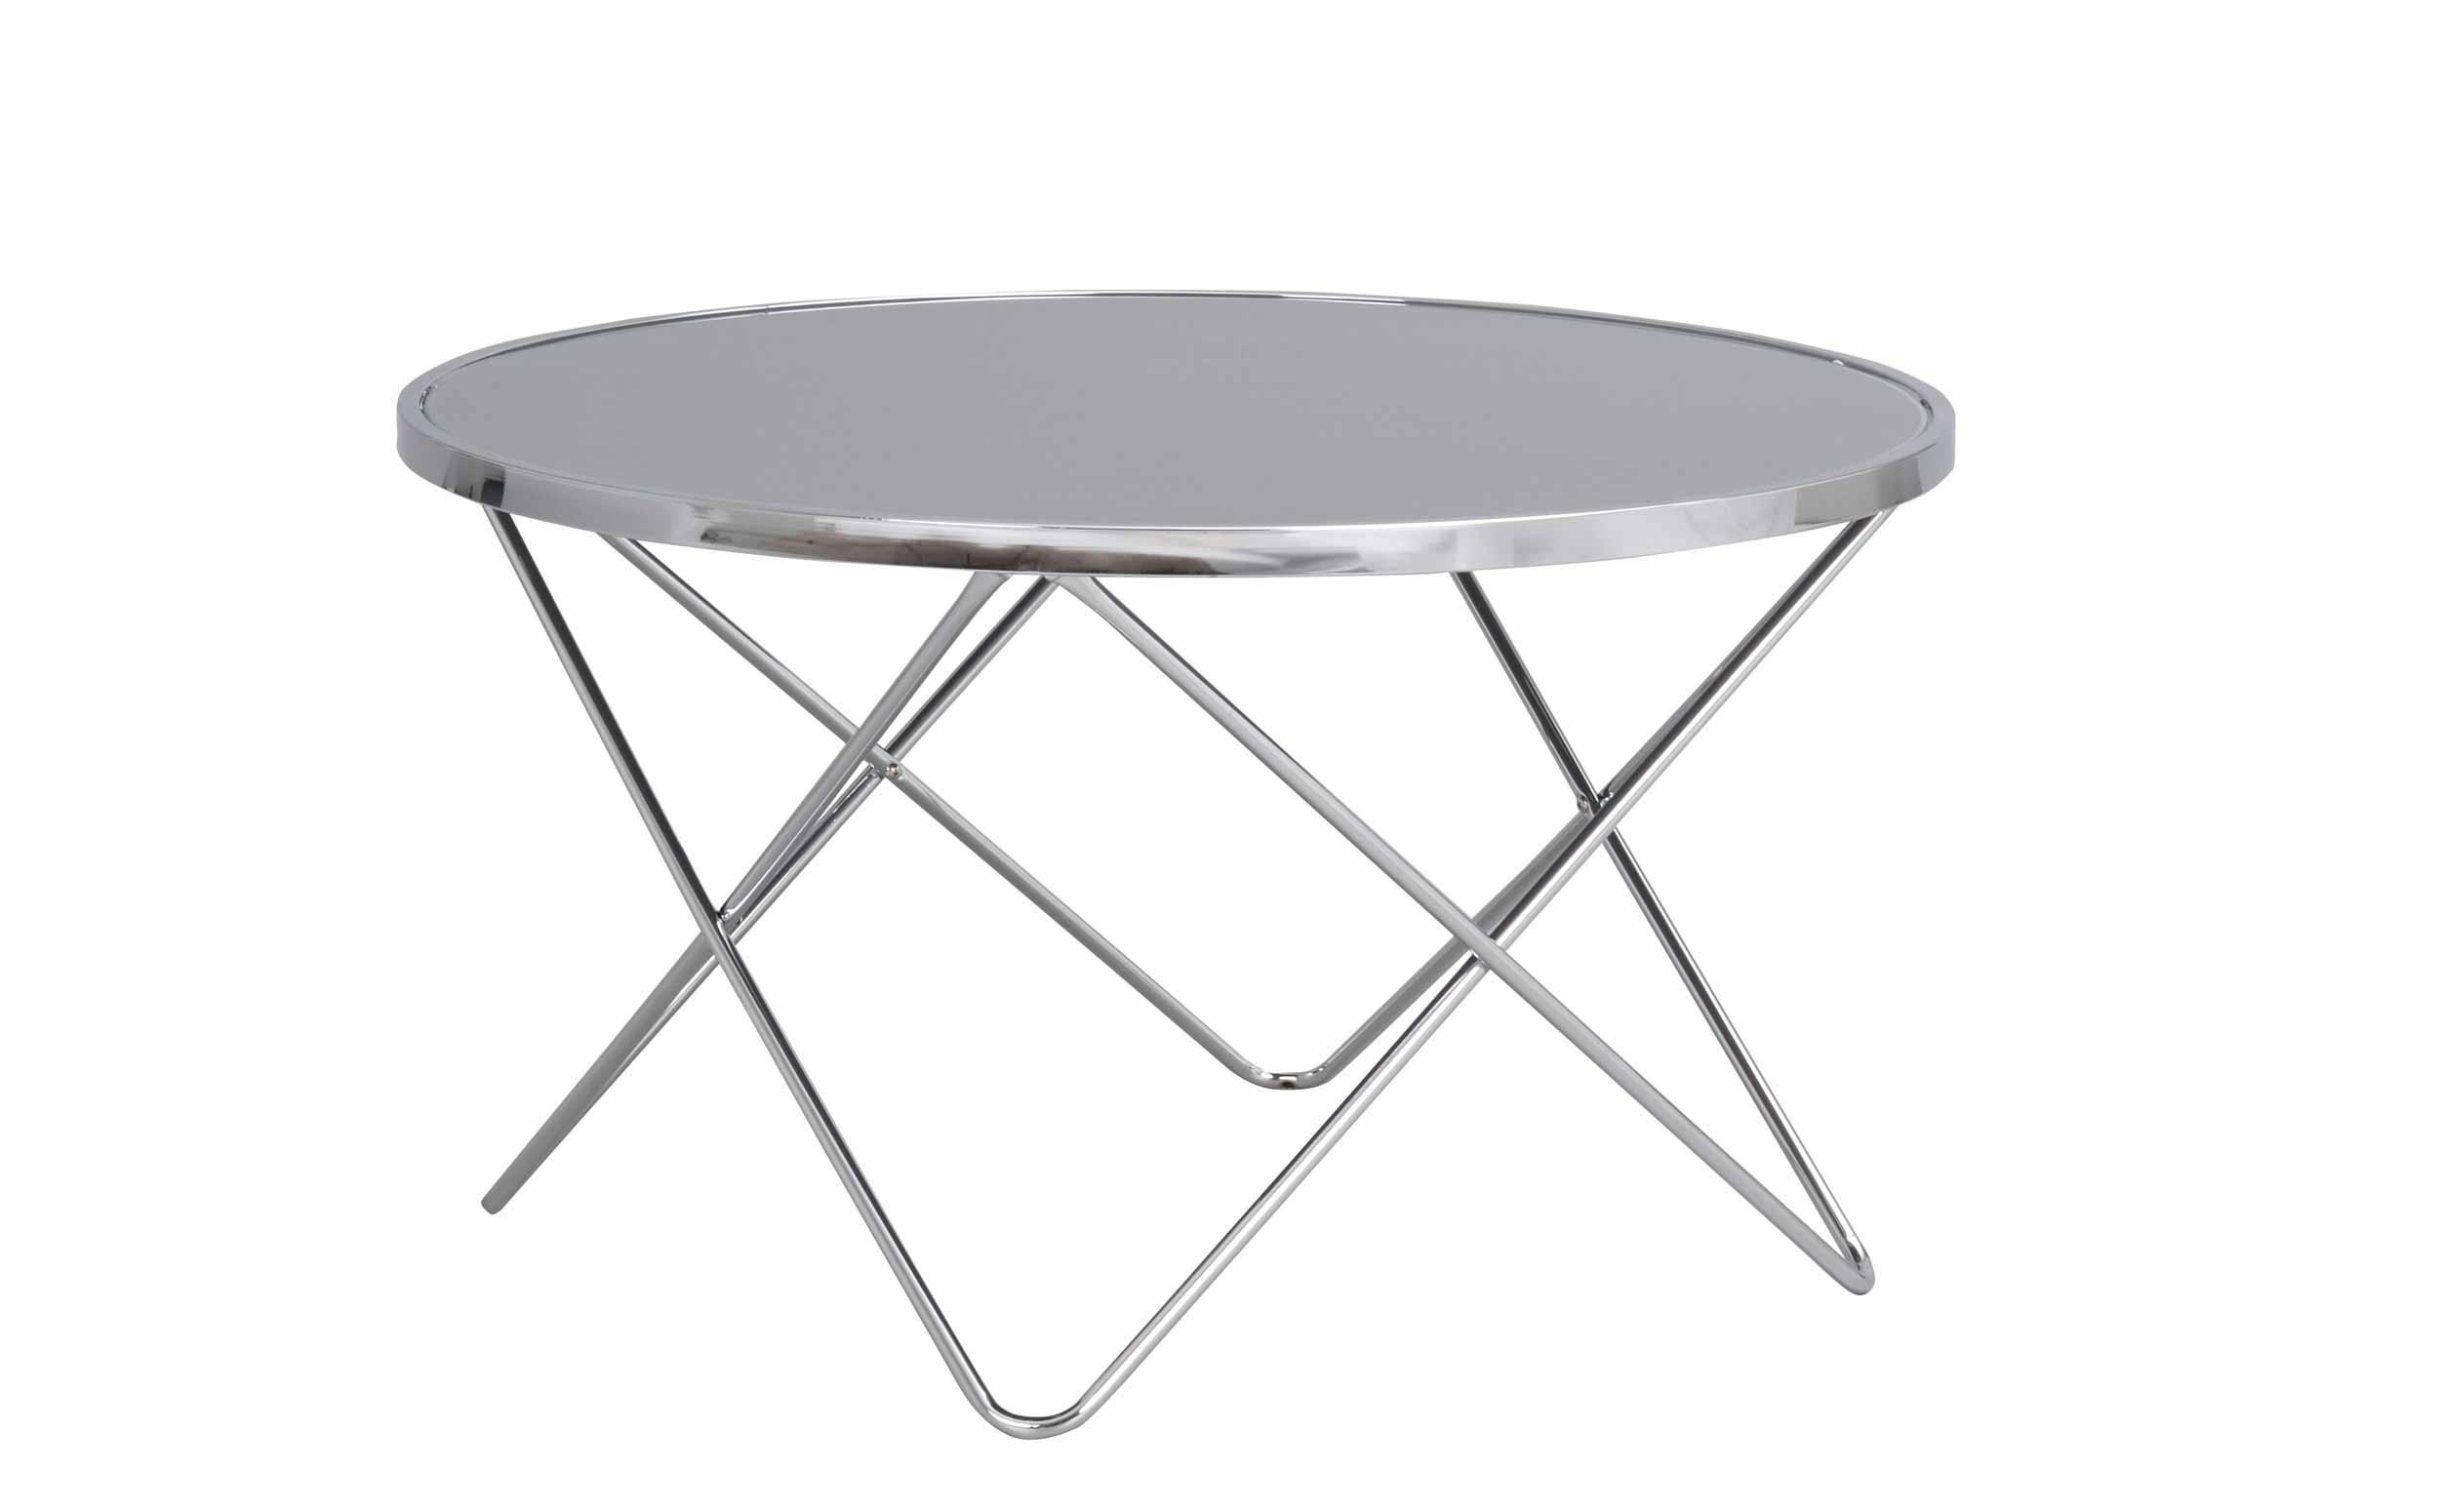 Stoke sofabord - Krom metal, rundt (Ø:85)